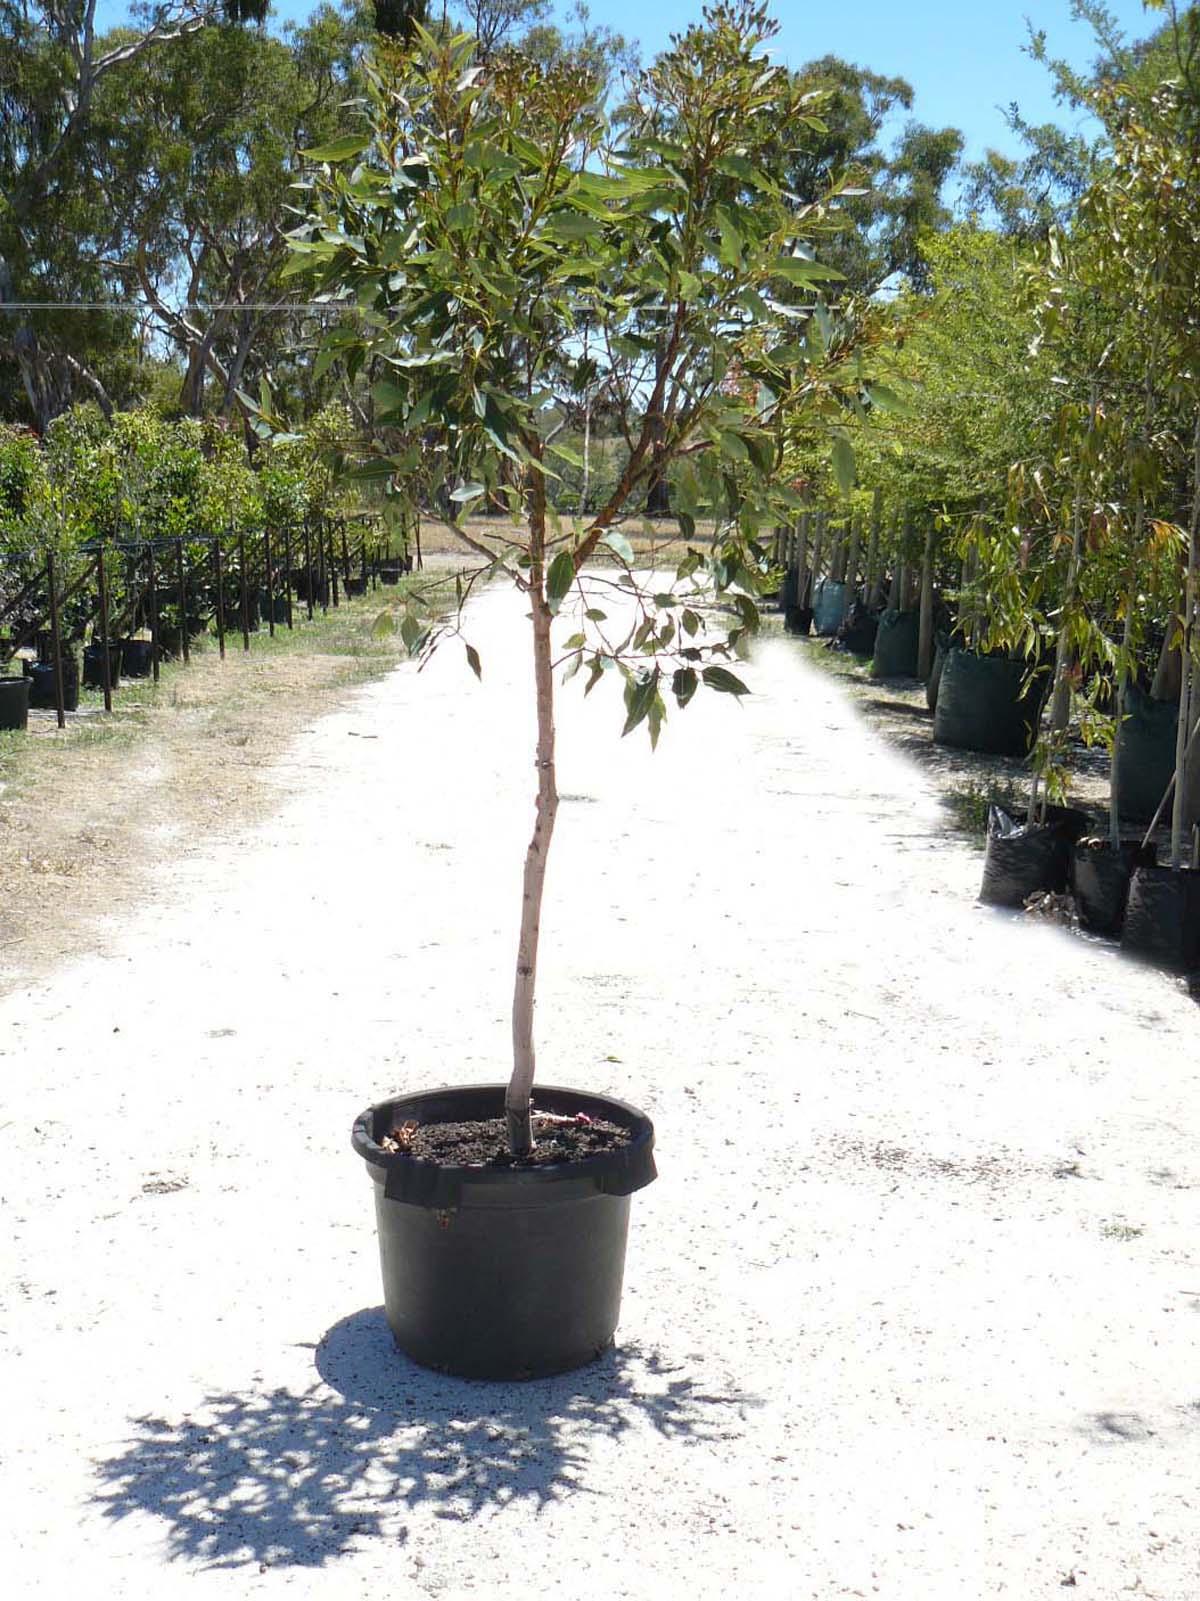 Corymbia (Eucalyptus) ficifolia